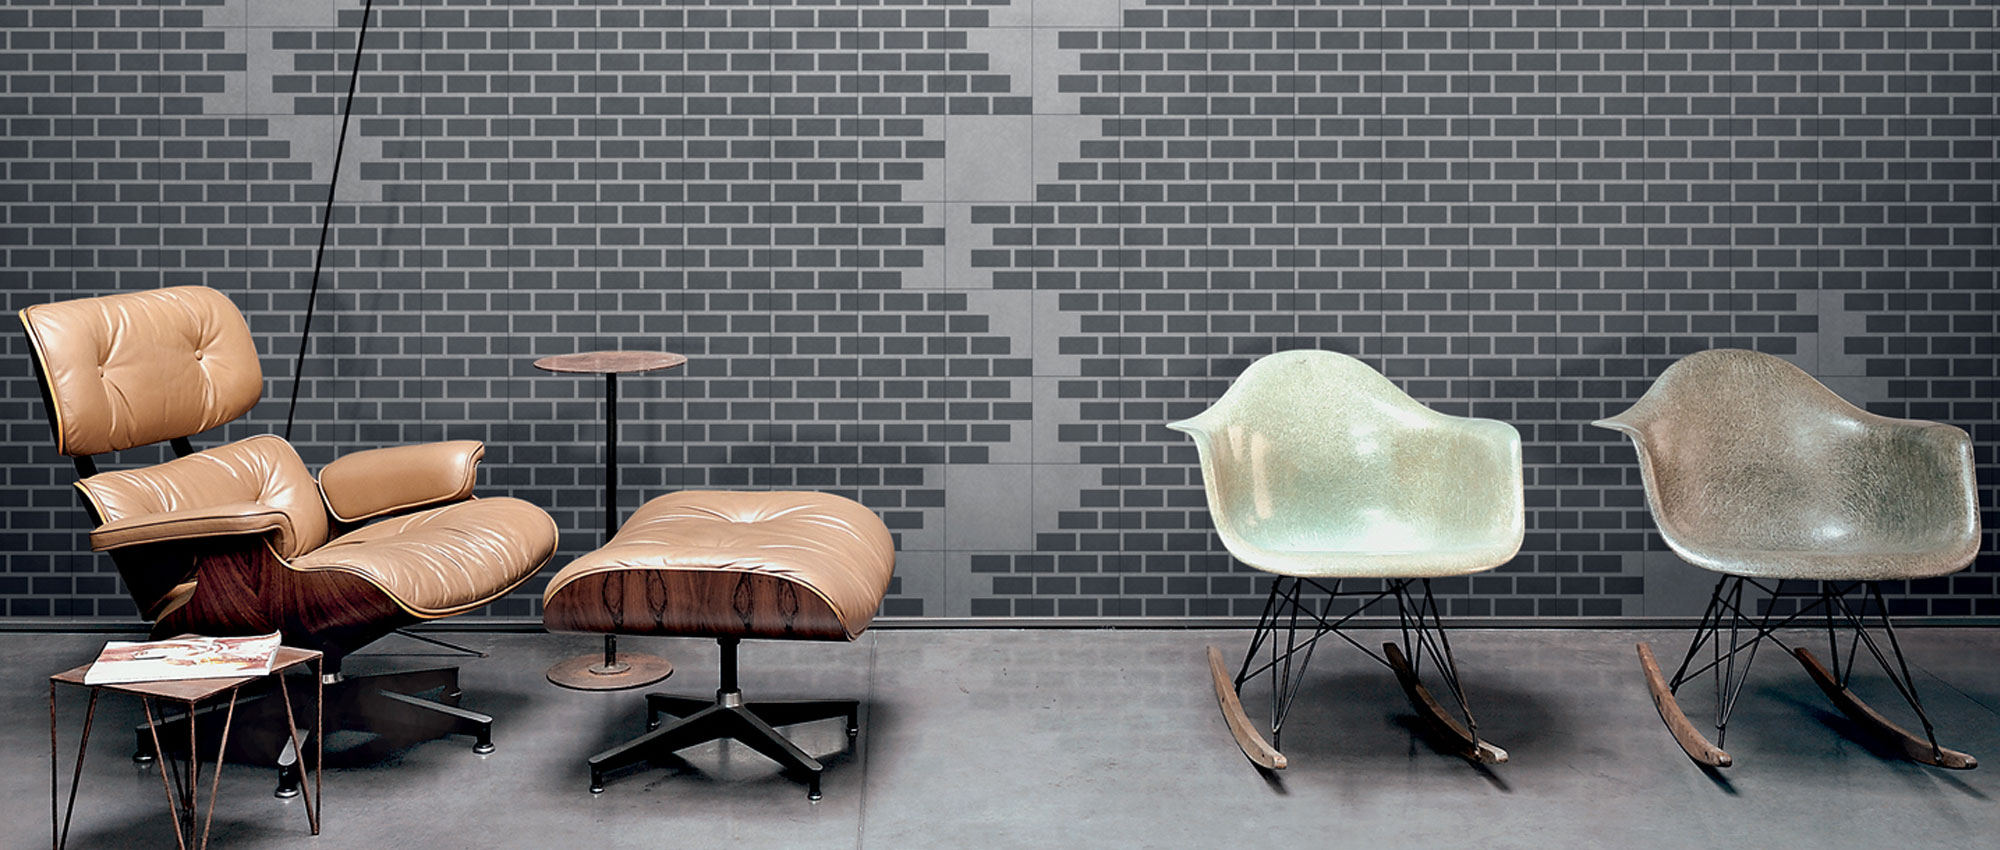 Carrelage design la maison du carrelage balma moderne for La maison du carrelage